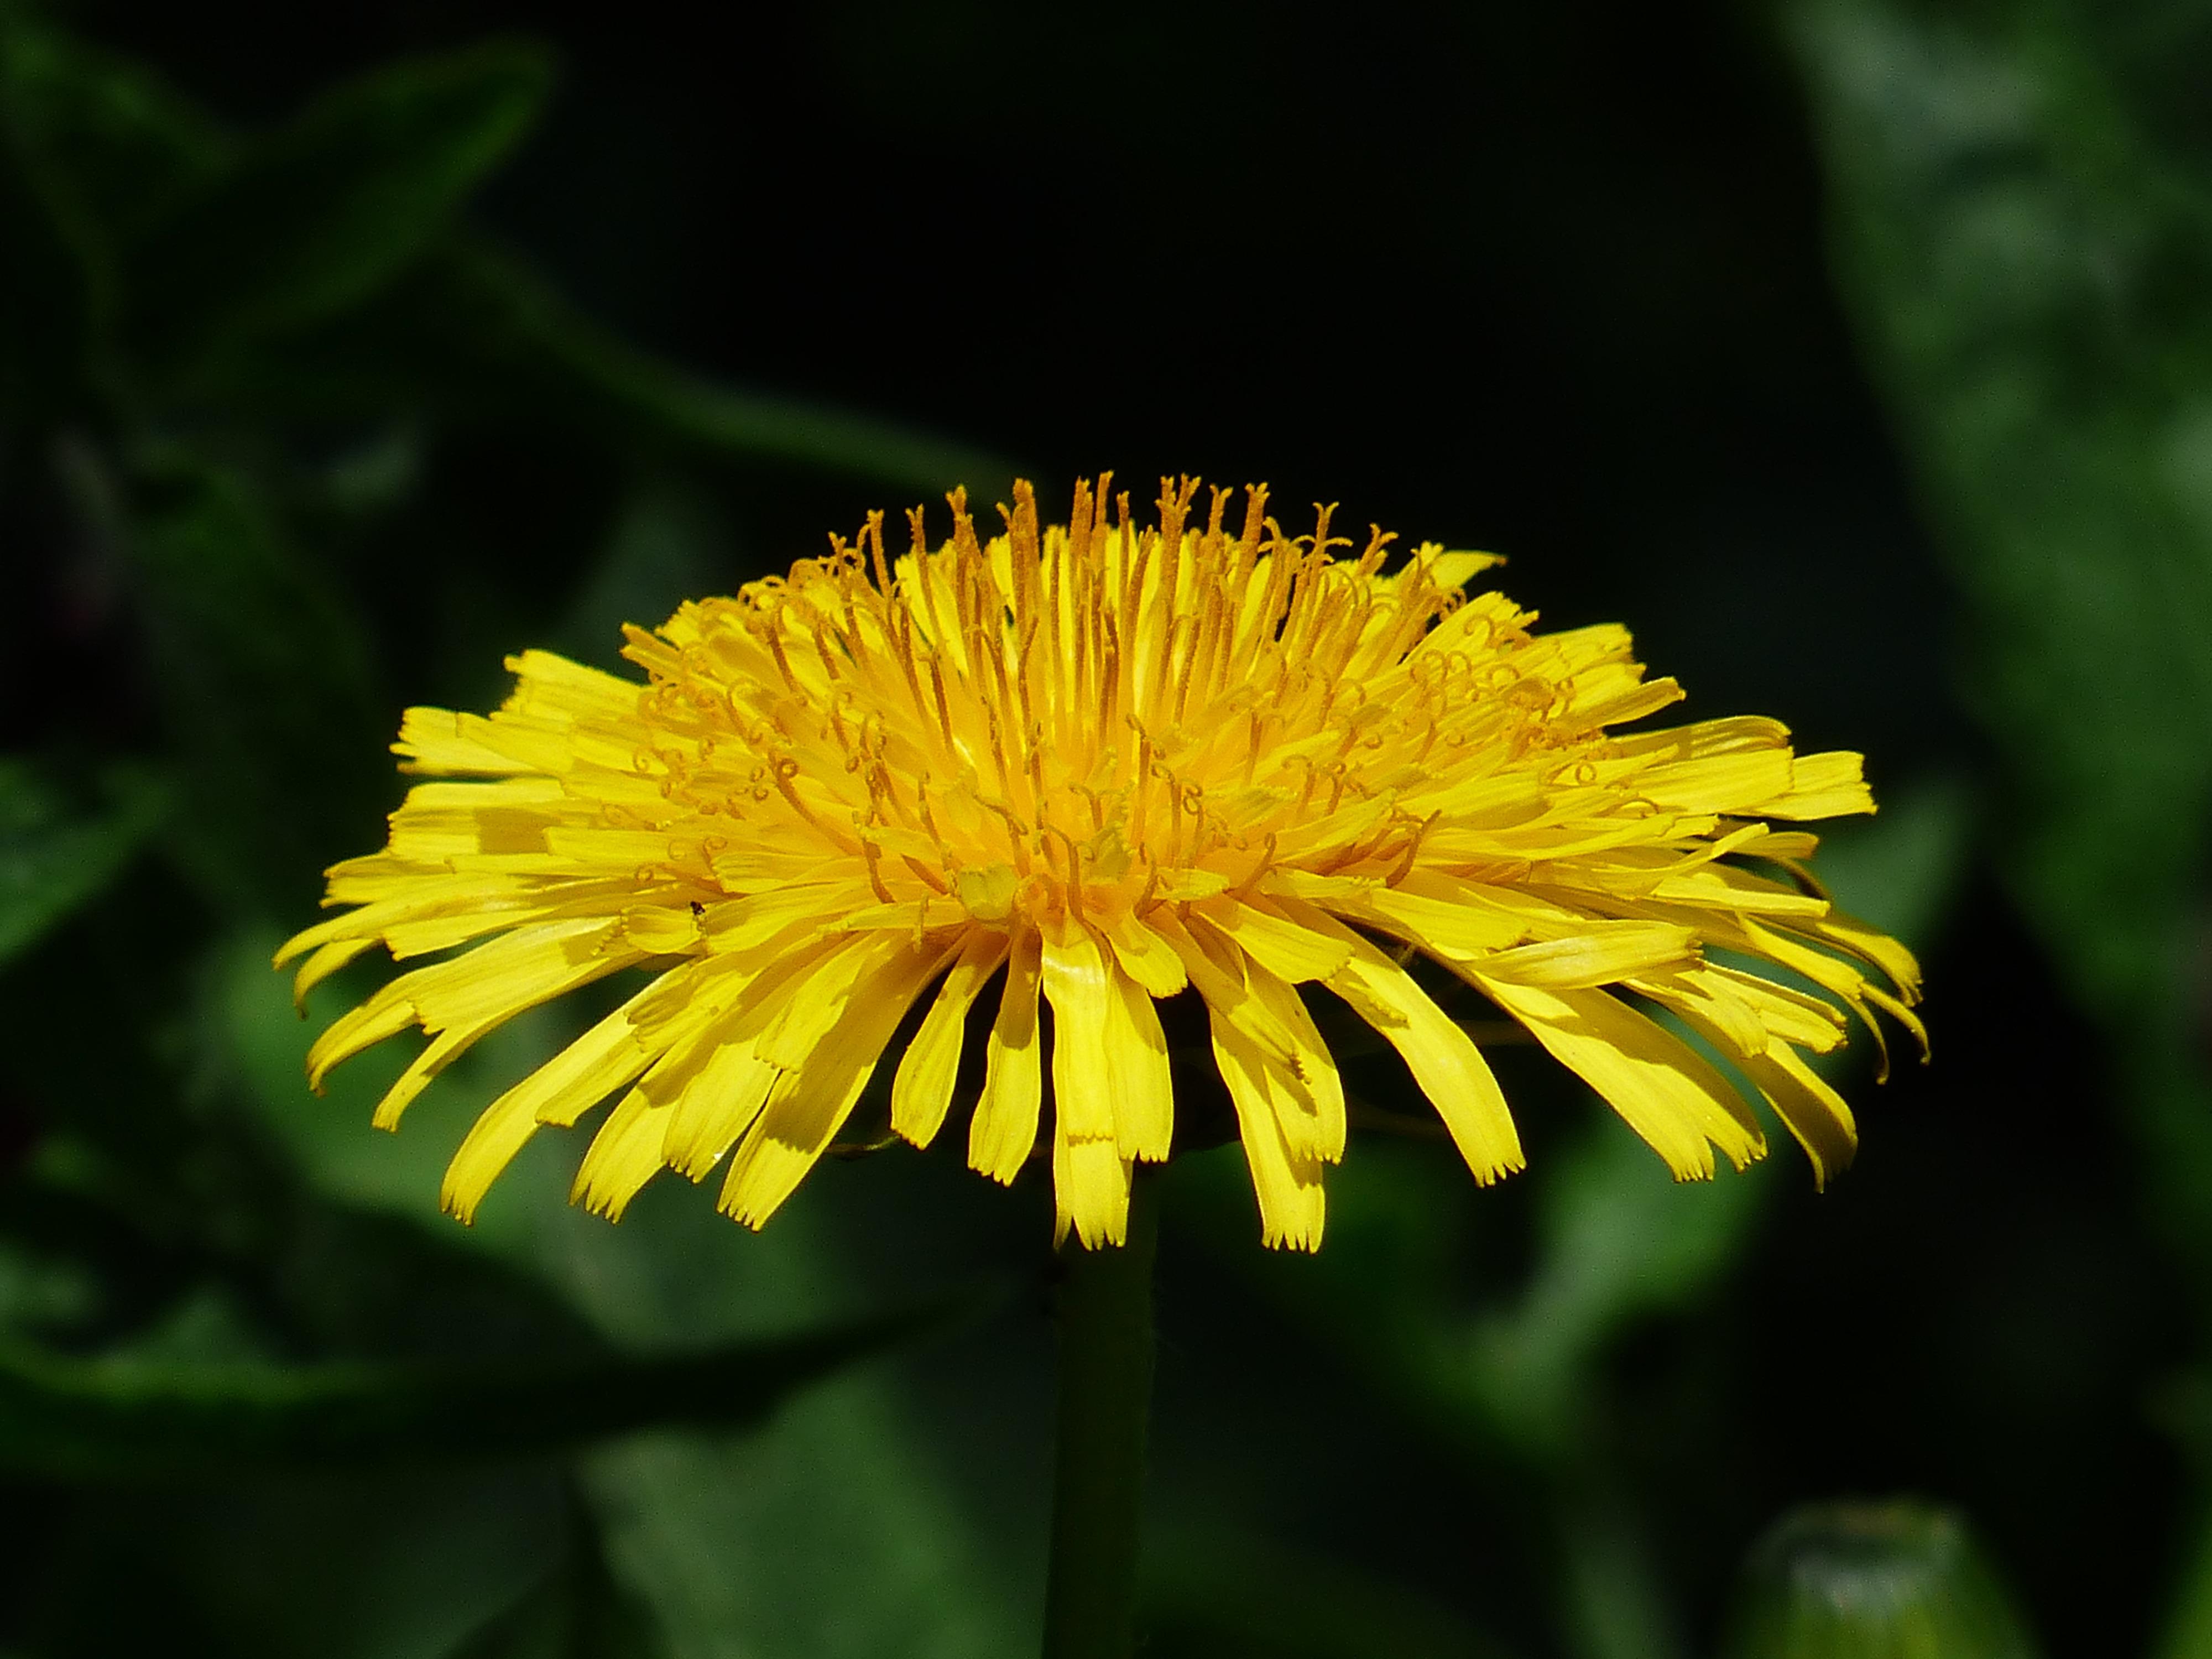 Free Images Nature Blossom Petal Bloom Summer Green Money